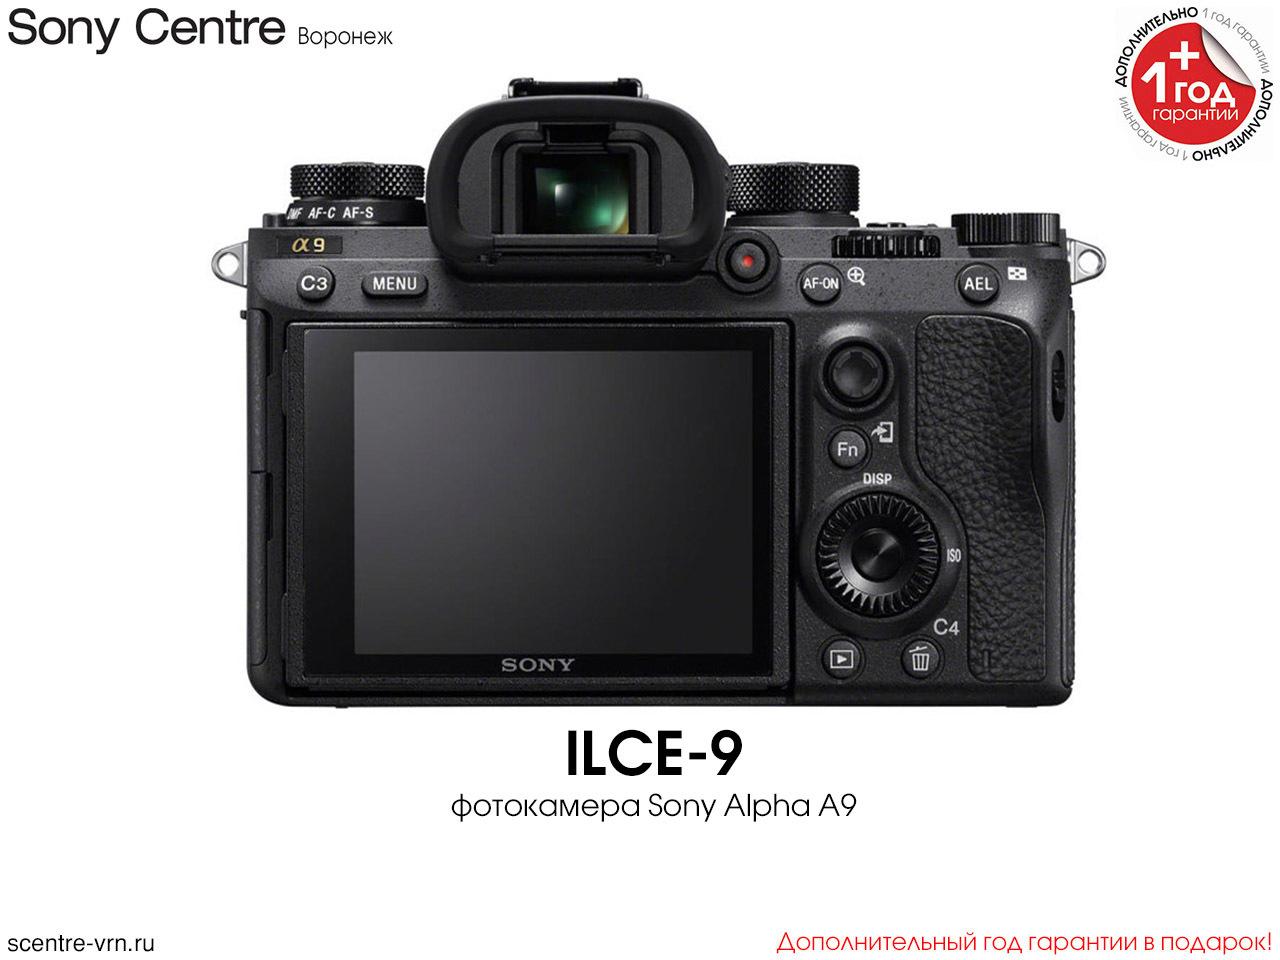 Полнокадровая фотокамера Sony A9